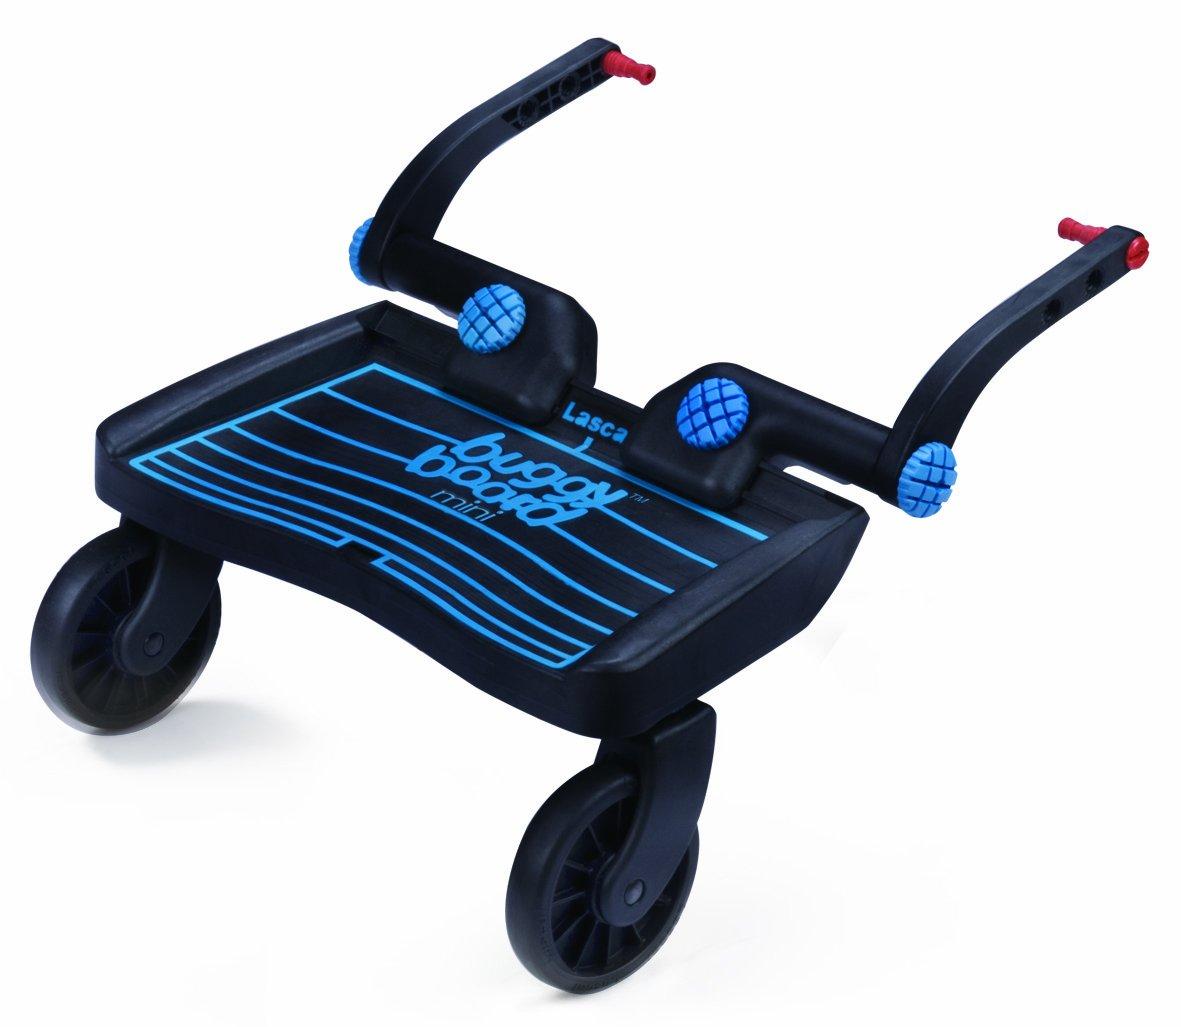 Lascal 2890 Buggy Board Mini, Thermoplastic Elastomer, schwarz/blau LNMB-BL